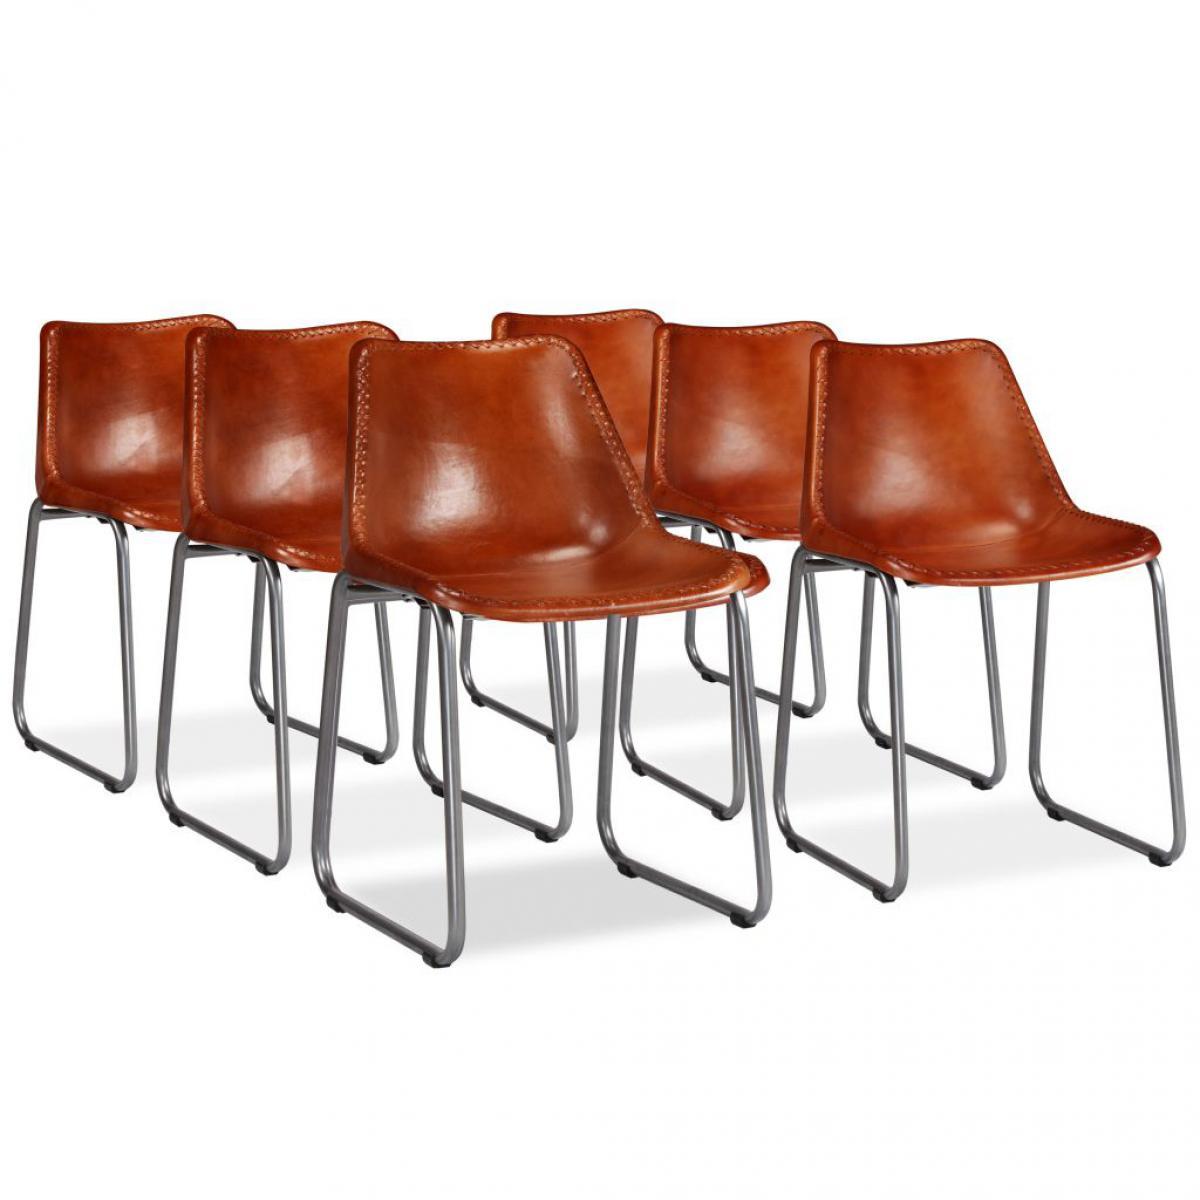 chaise salle manger cuir marron